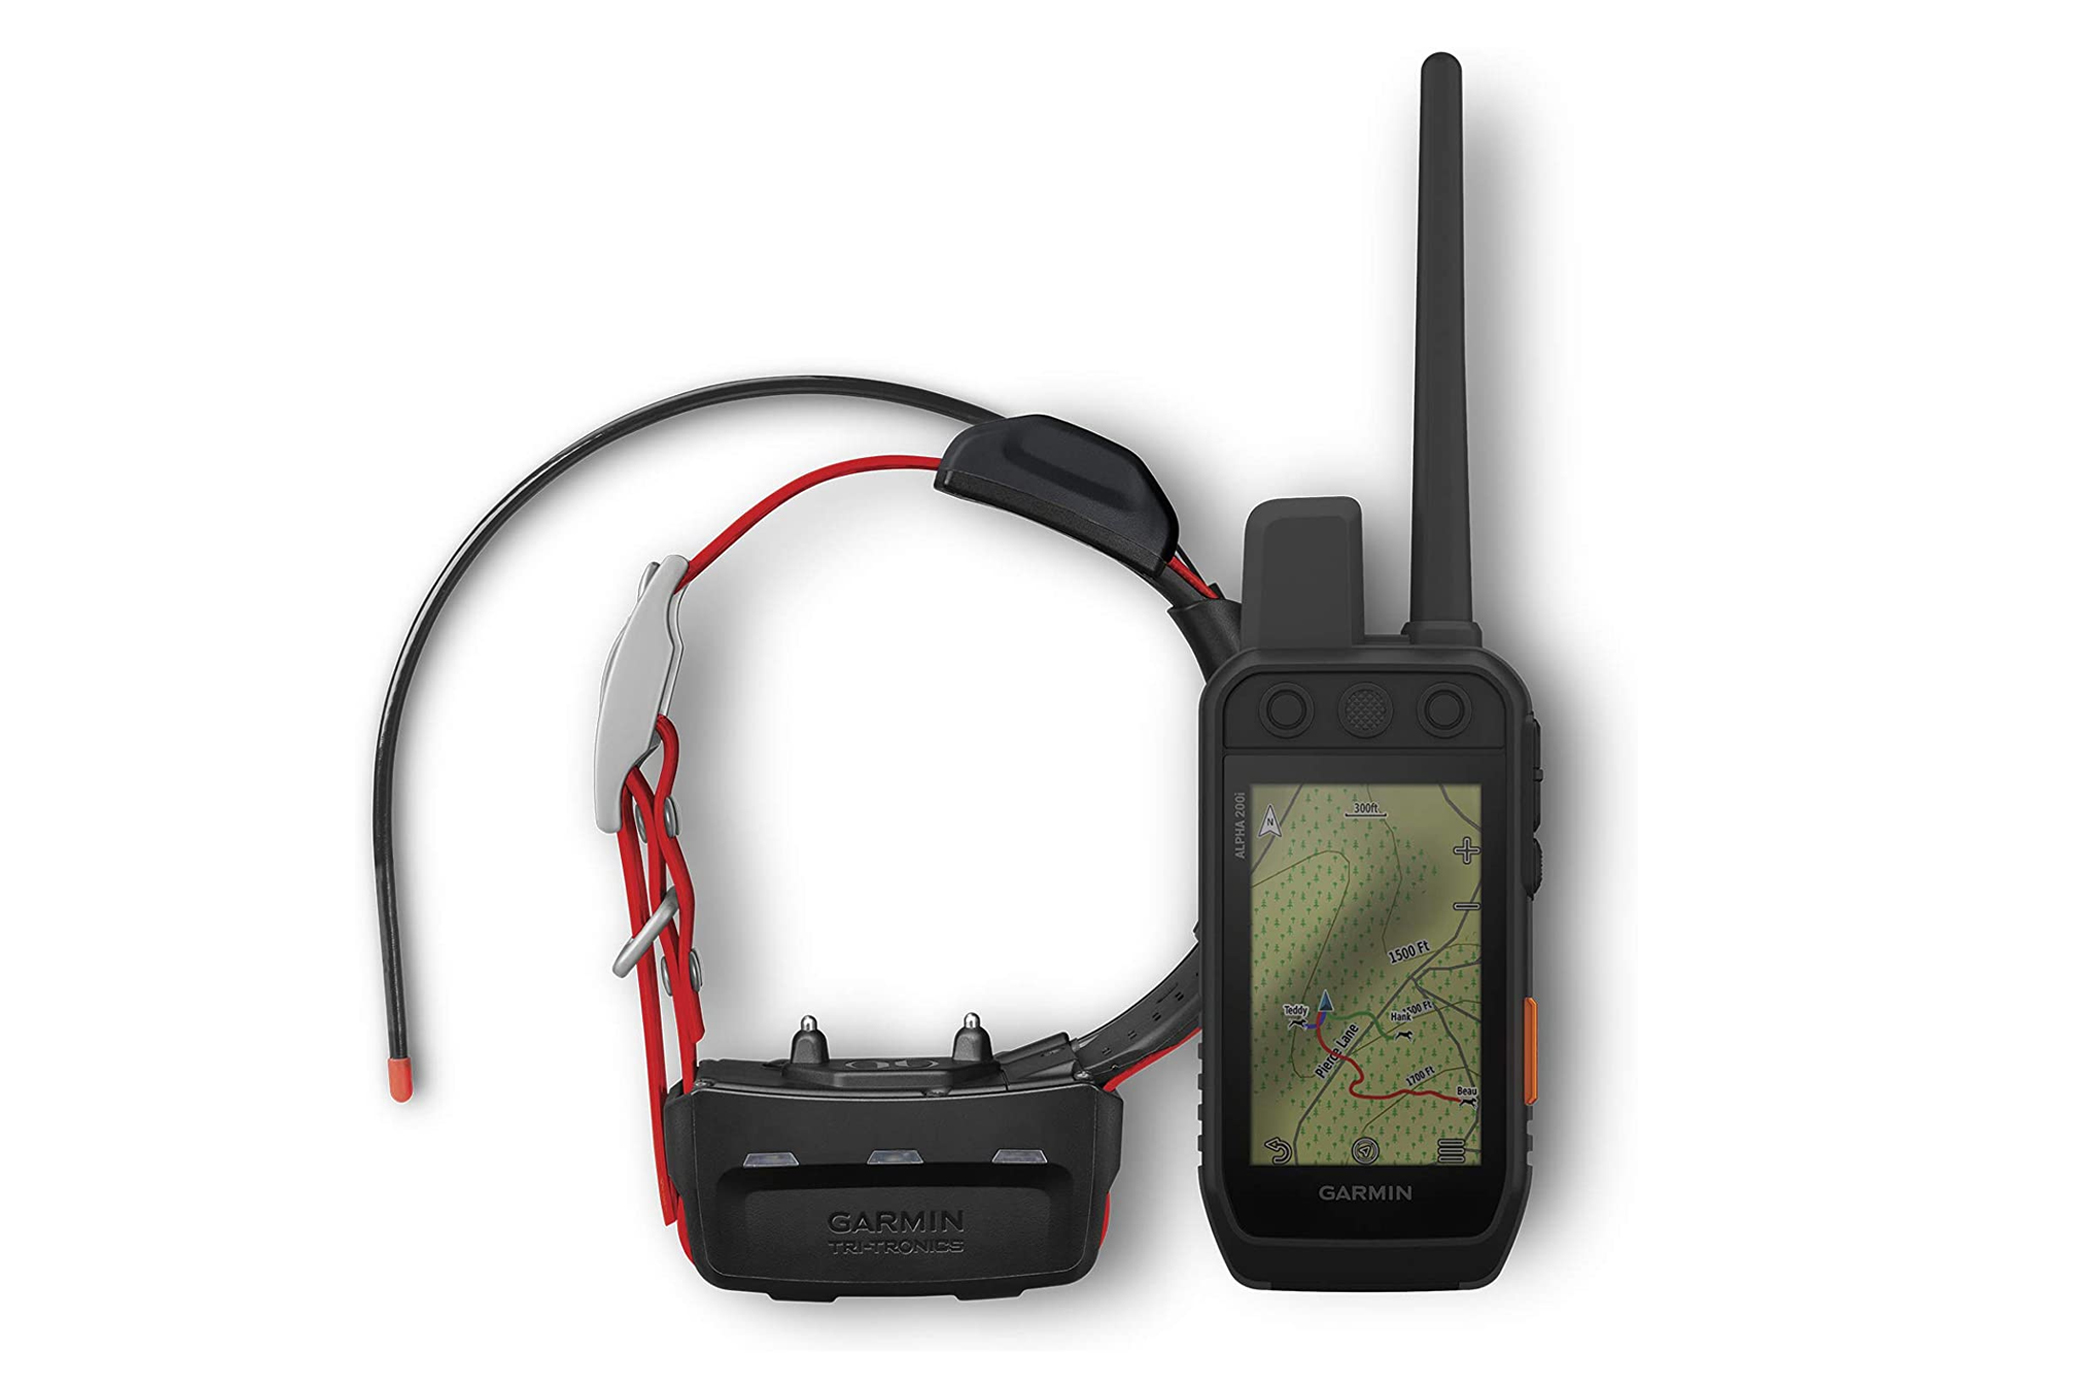 garmin alpha 200i & tt 15 tracking bundle